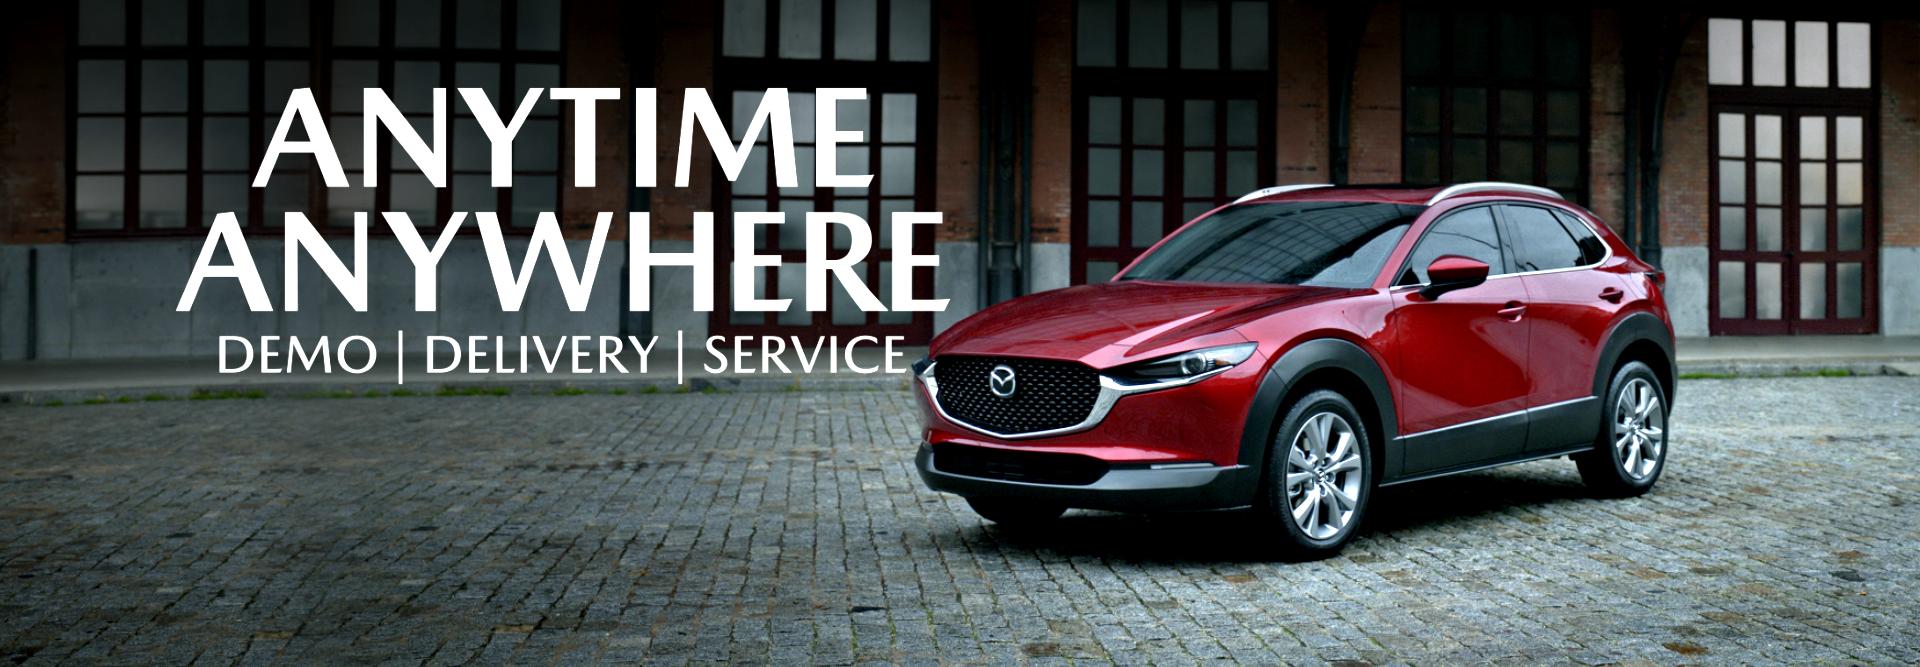 Kelebihan Kekurangan Mazda Servis Murah Berkualitas